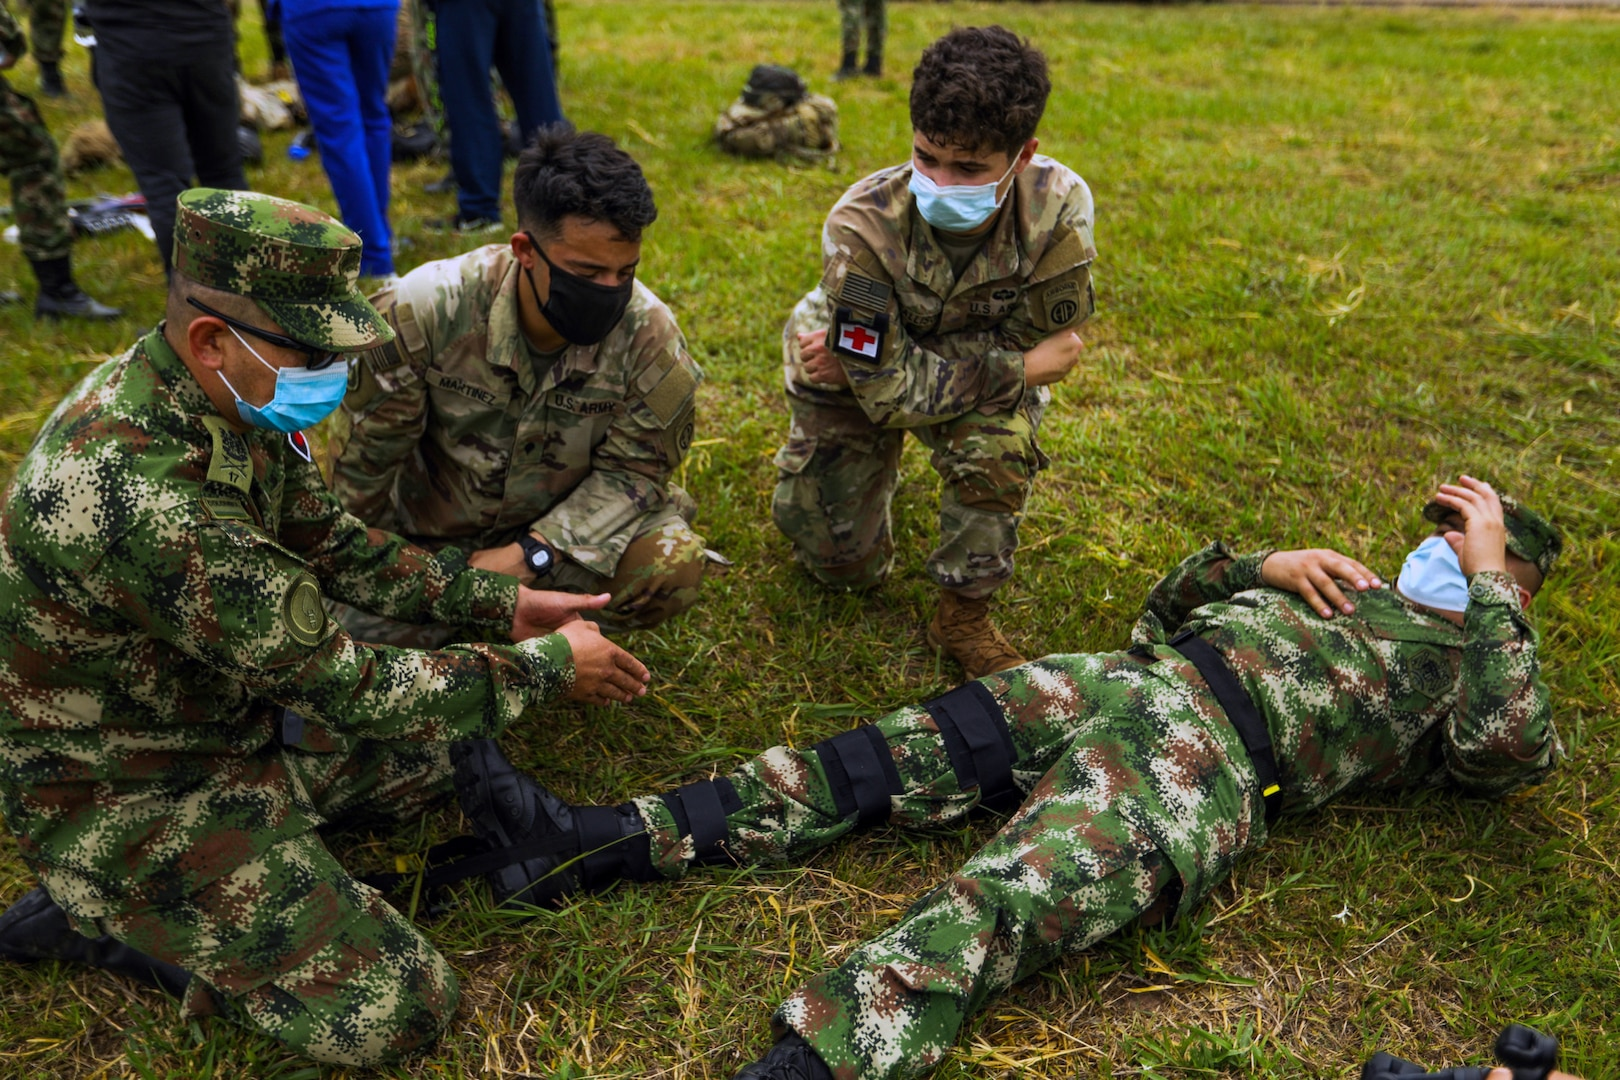 TOLEMAIDA AIR BASE, Colombia medical evacuation rehearsals